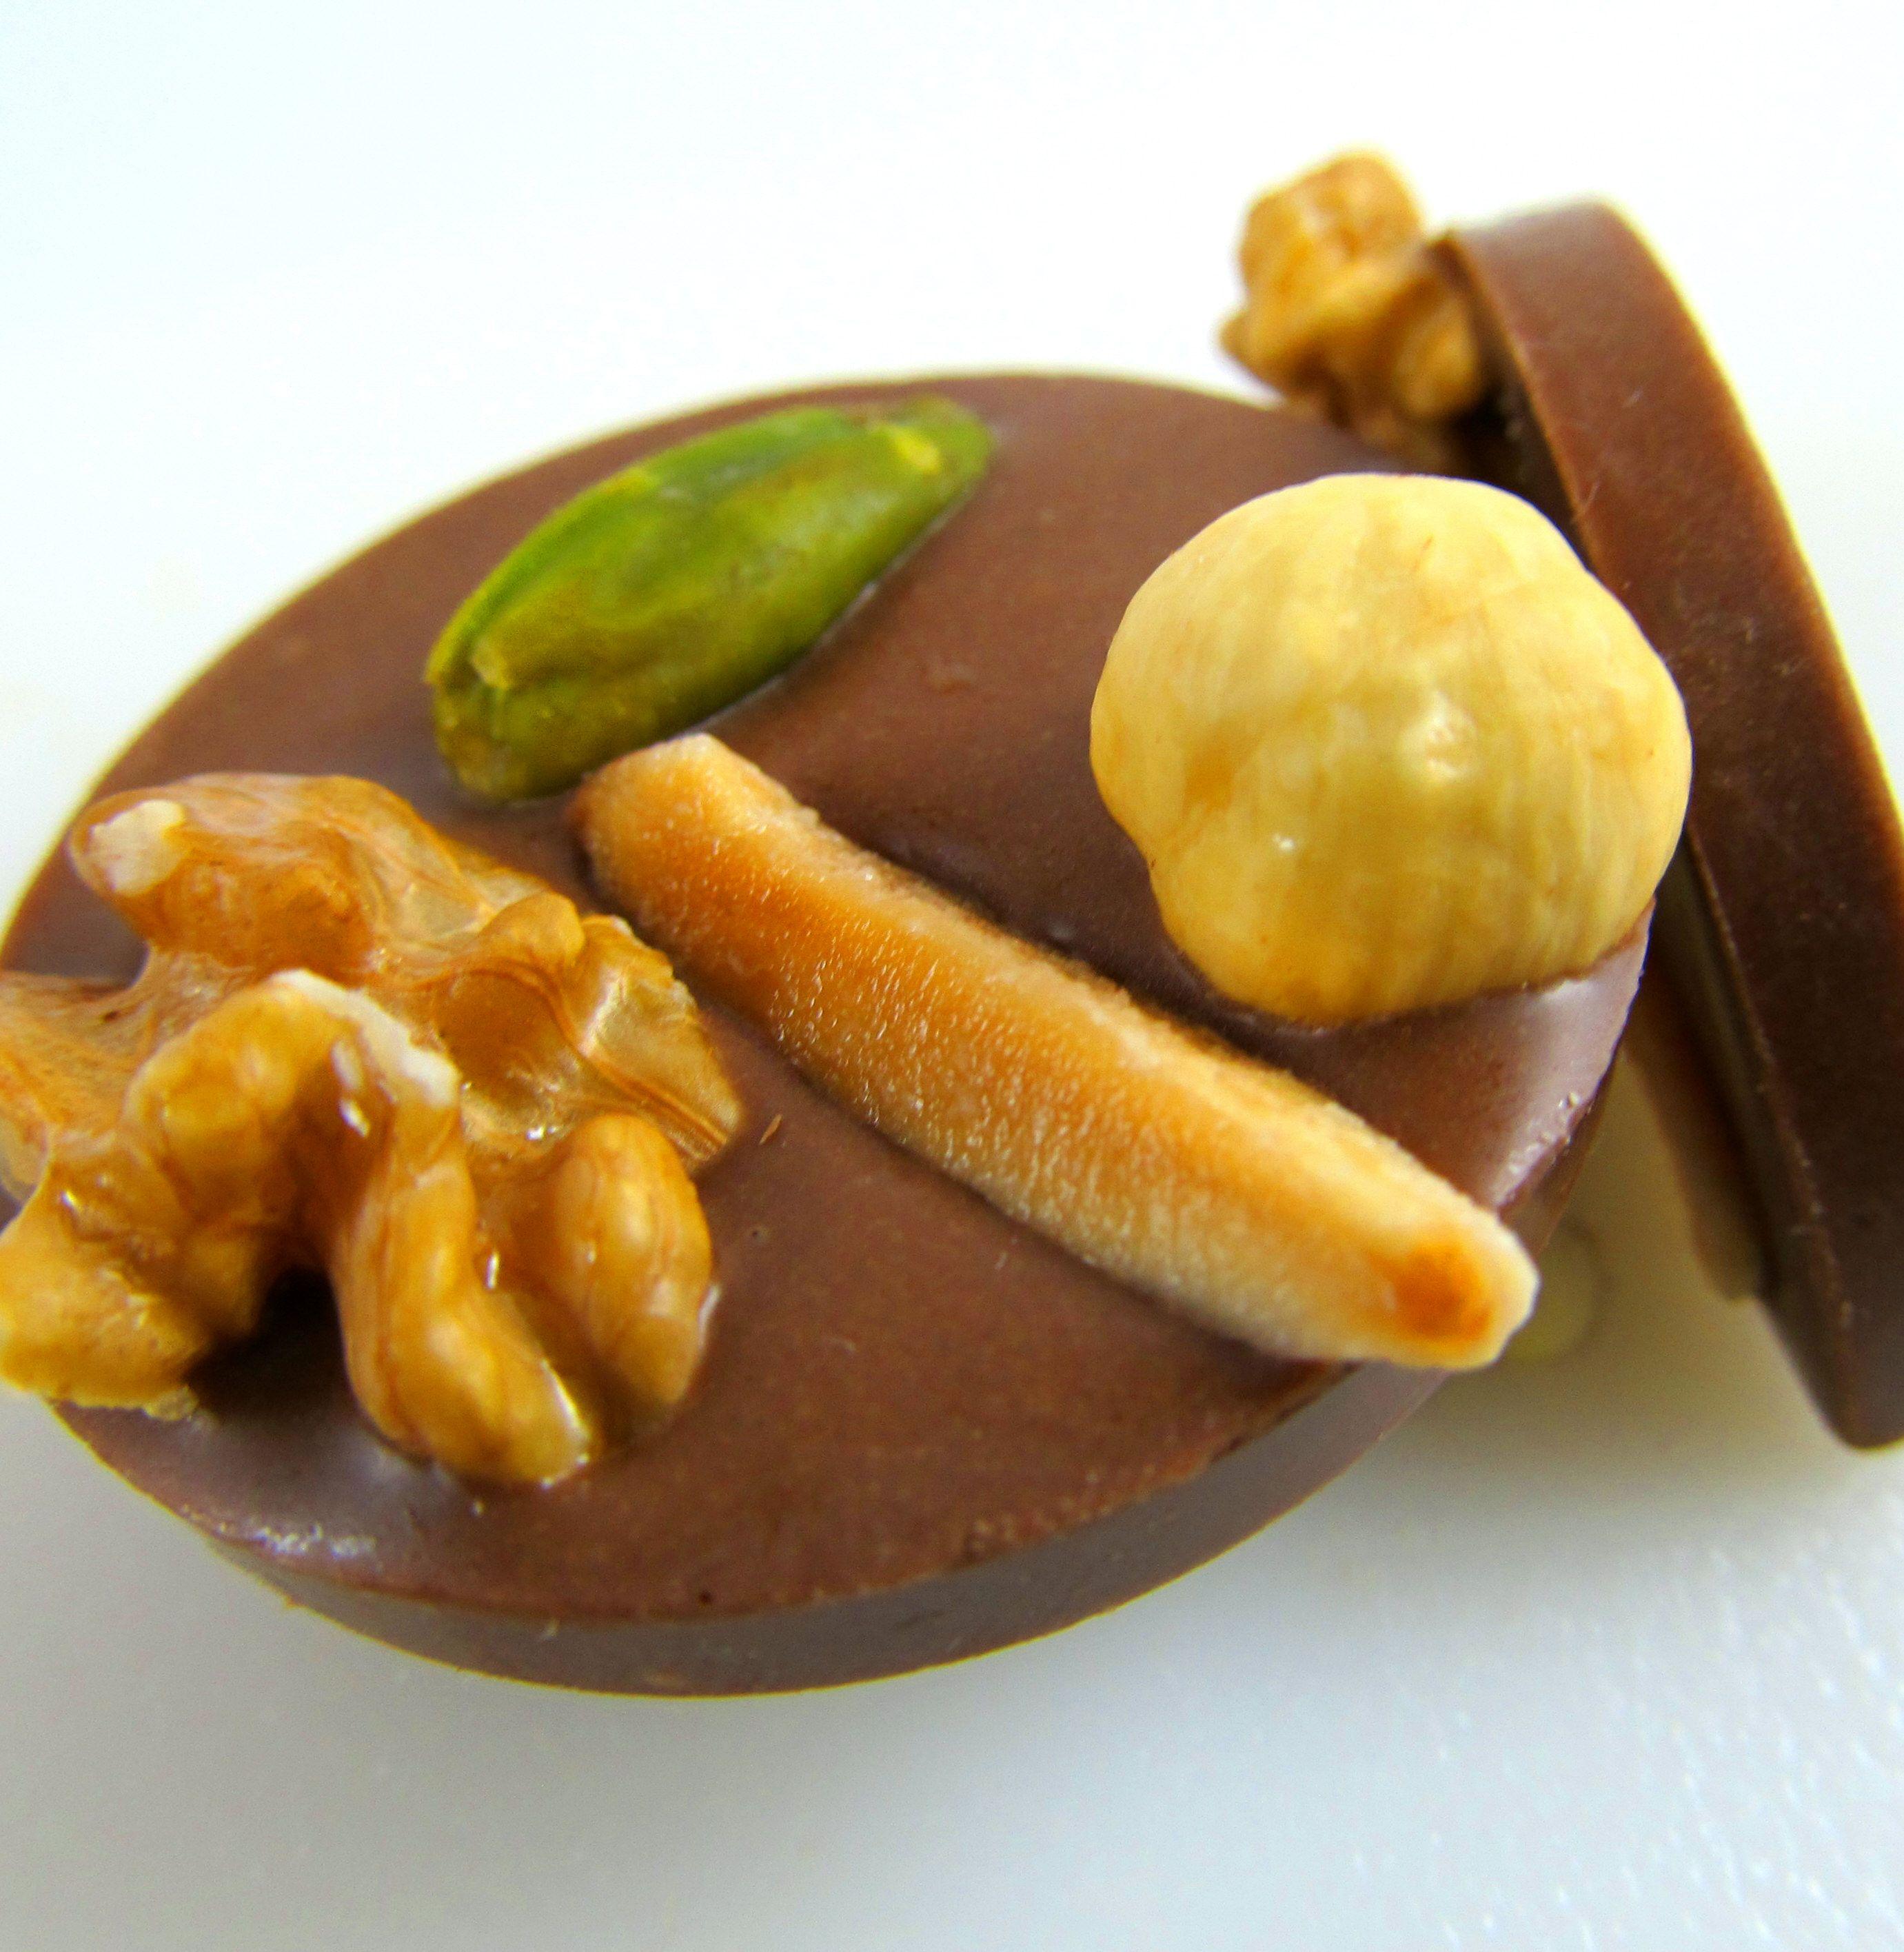 Chocolates by Bernard Callebaut in Regina. Order online at ChocolateRegina.com